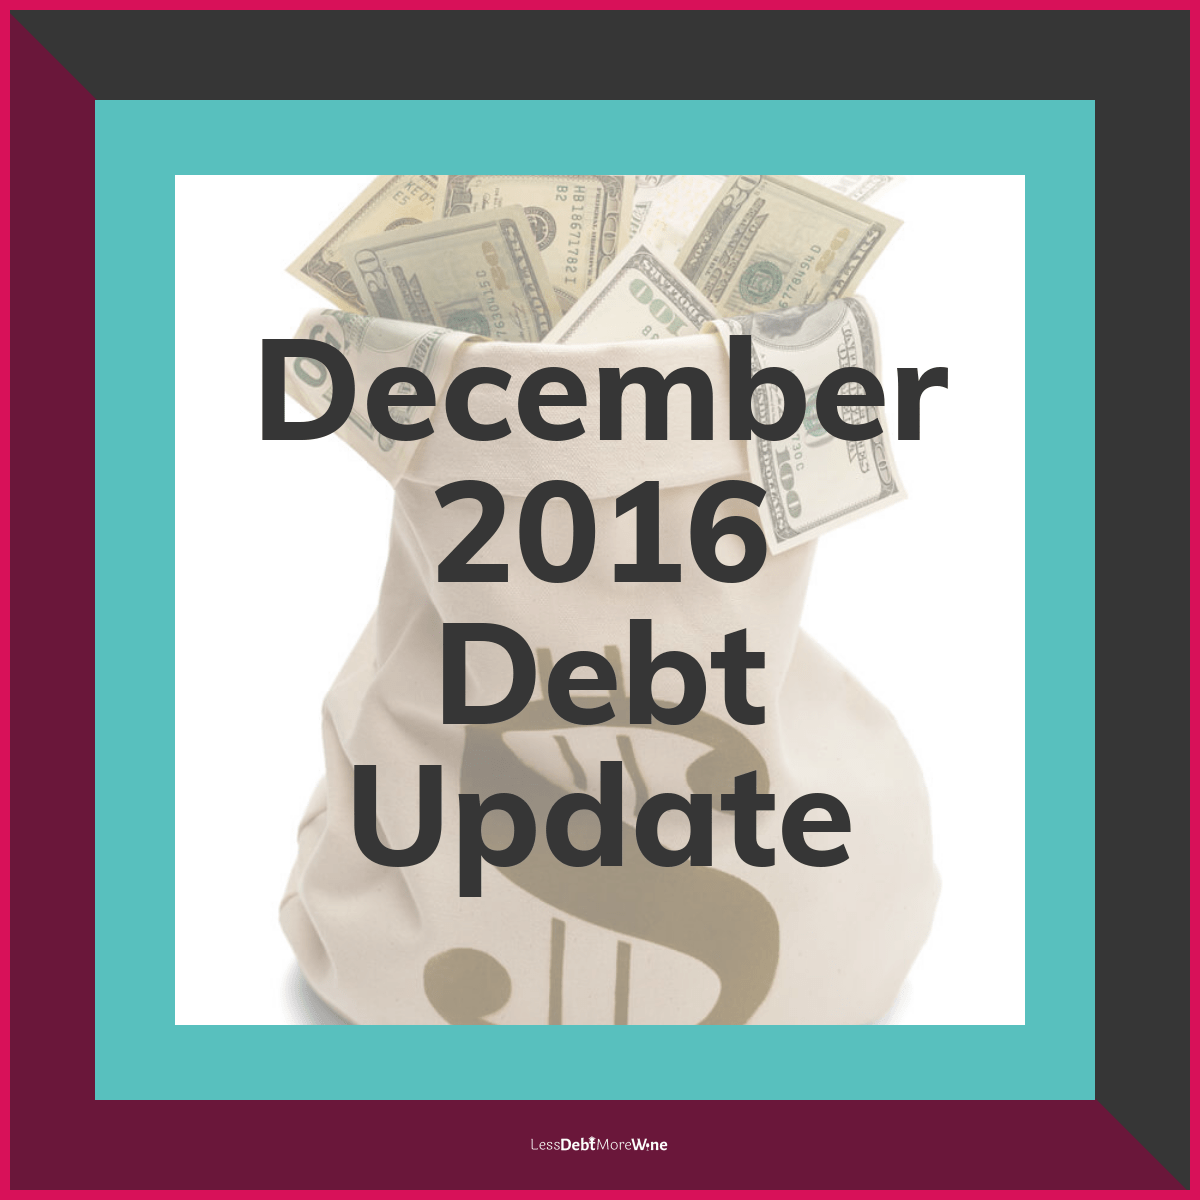 December 2016 debt update, debt payoff progress